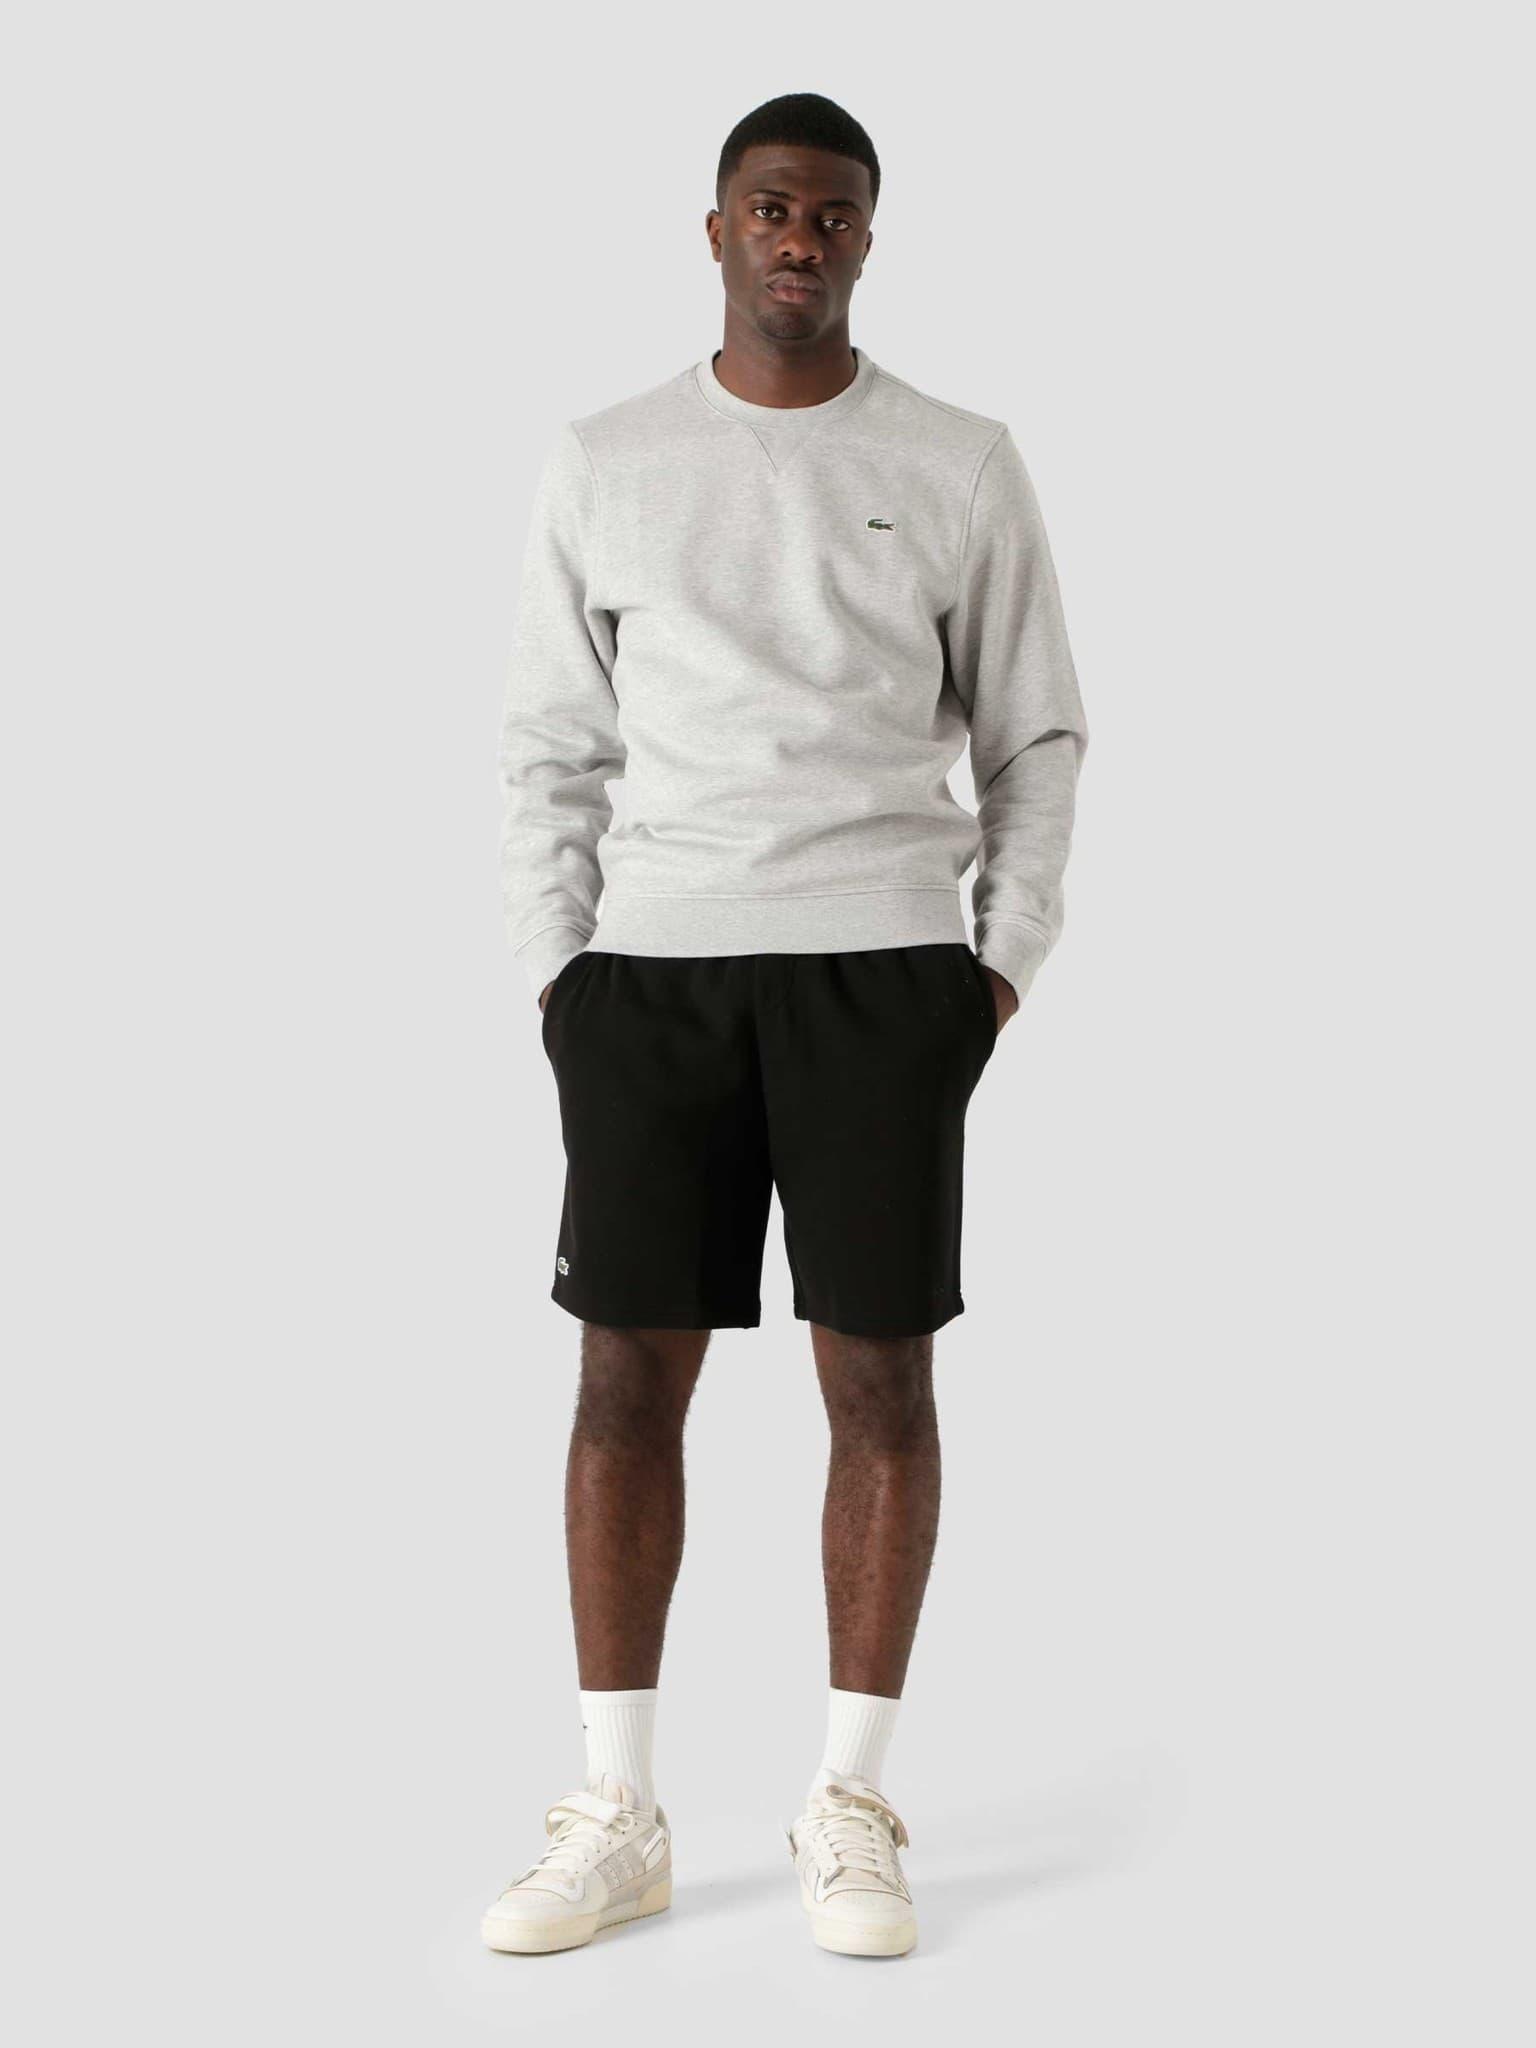 1HS1 Men's Sweater Silver Chine Elephant SH1505-11